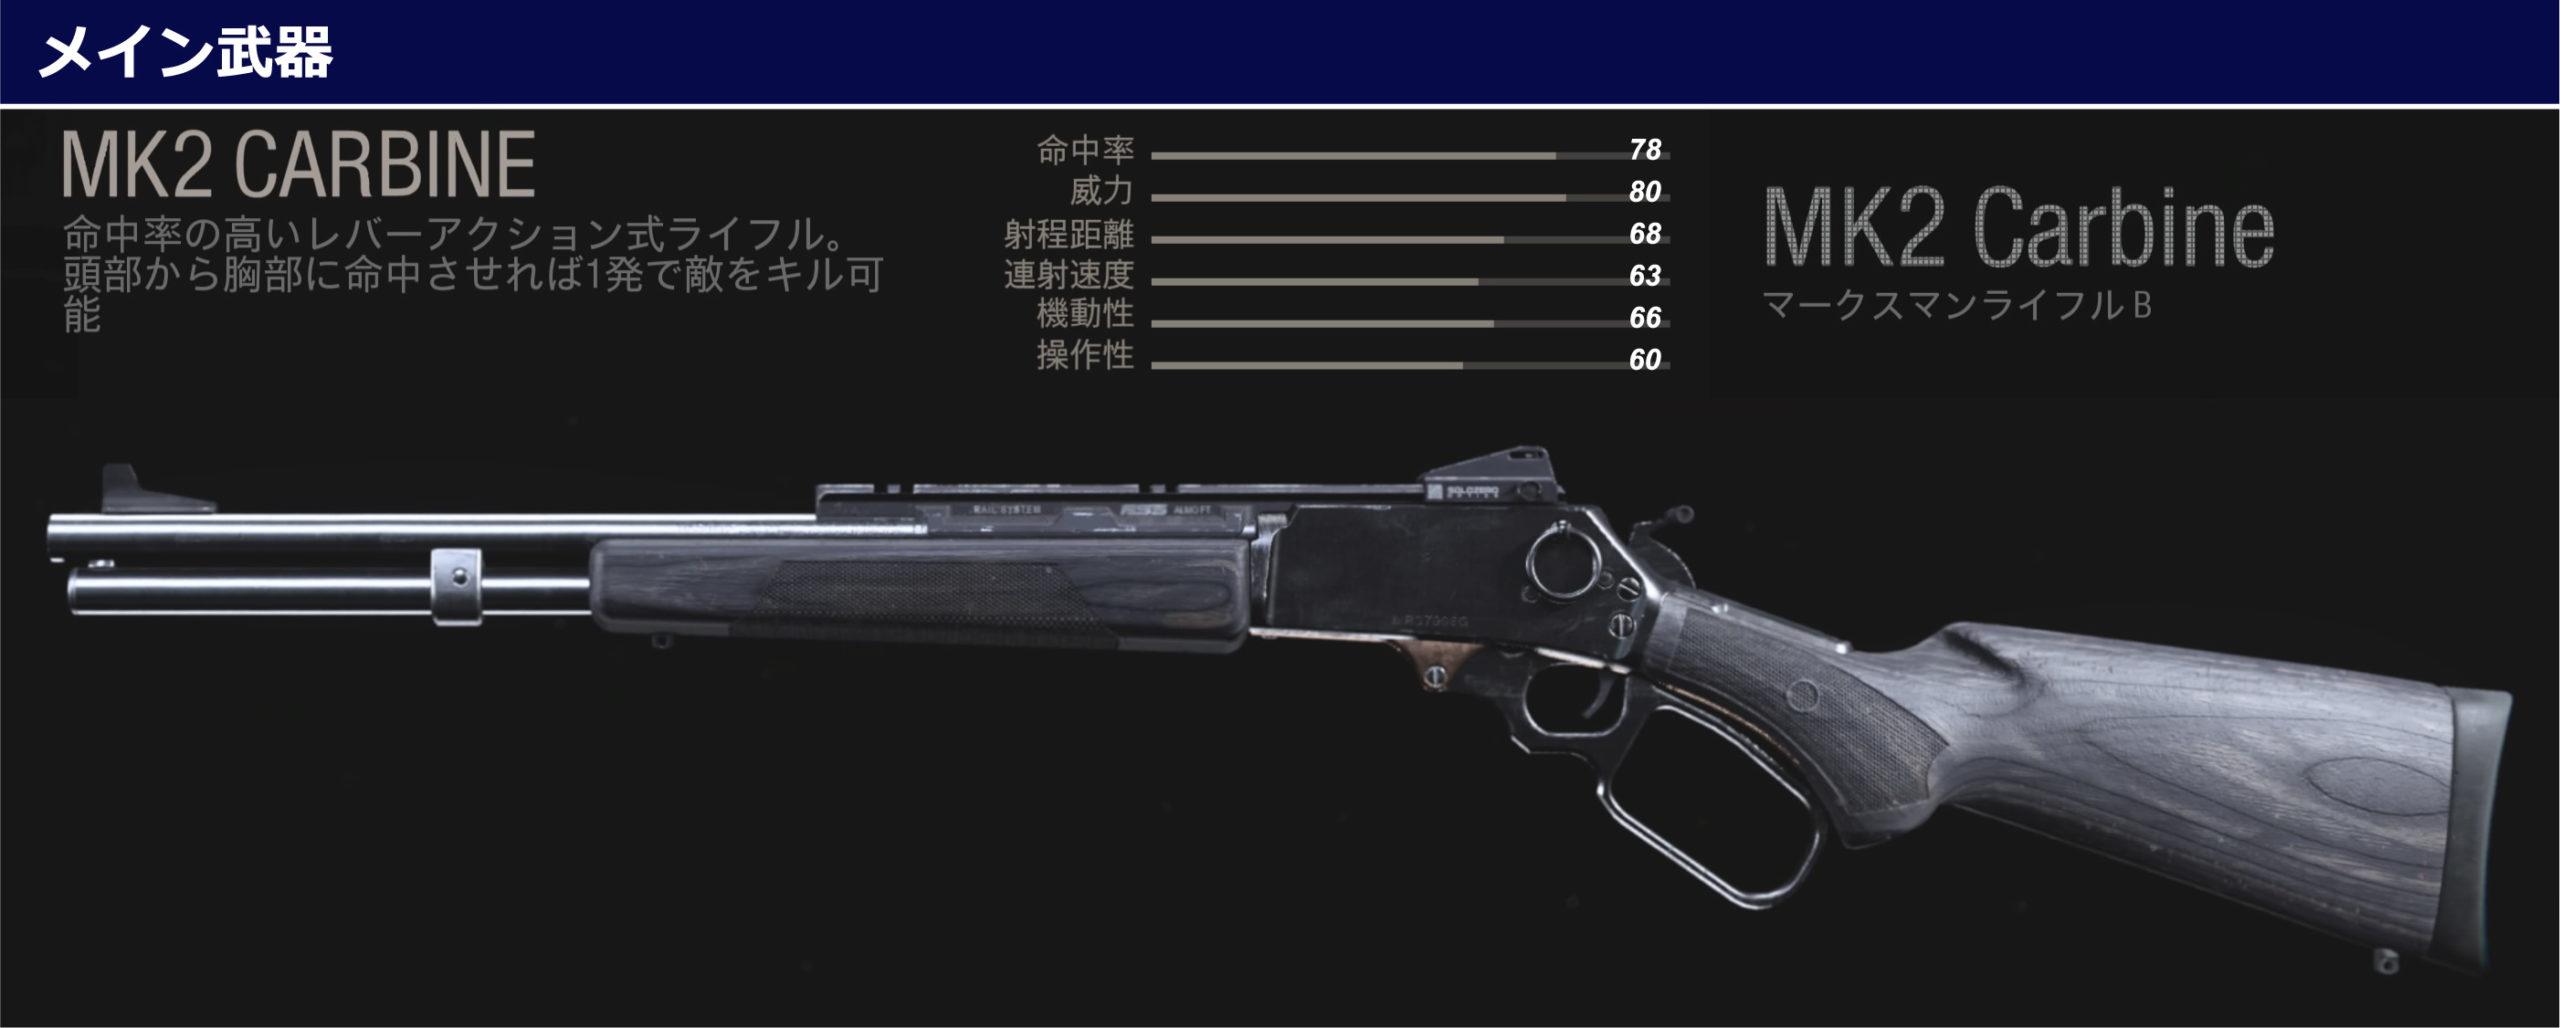 MK2-Carbine